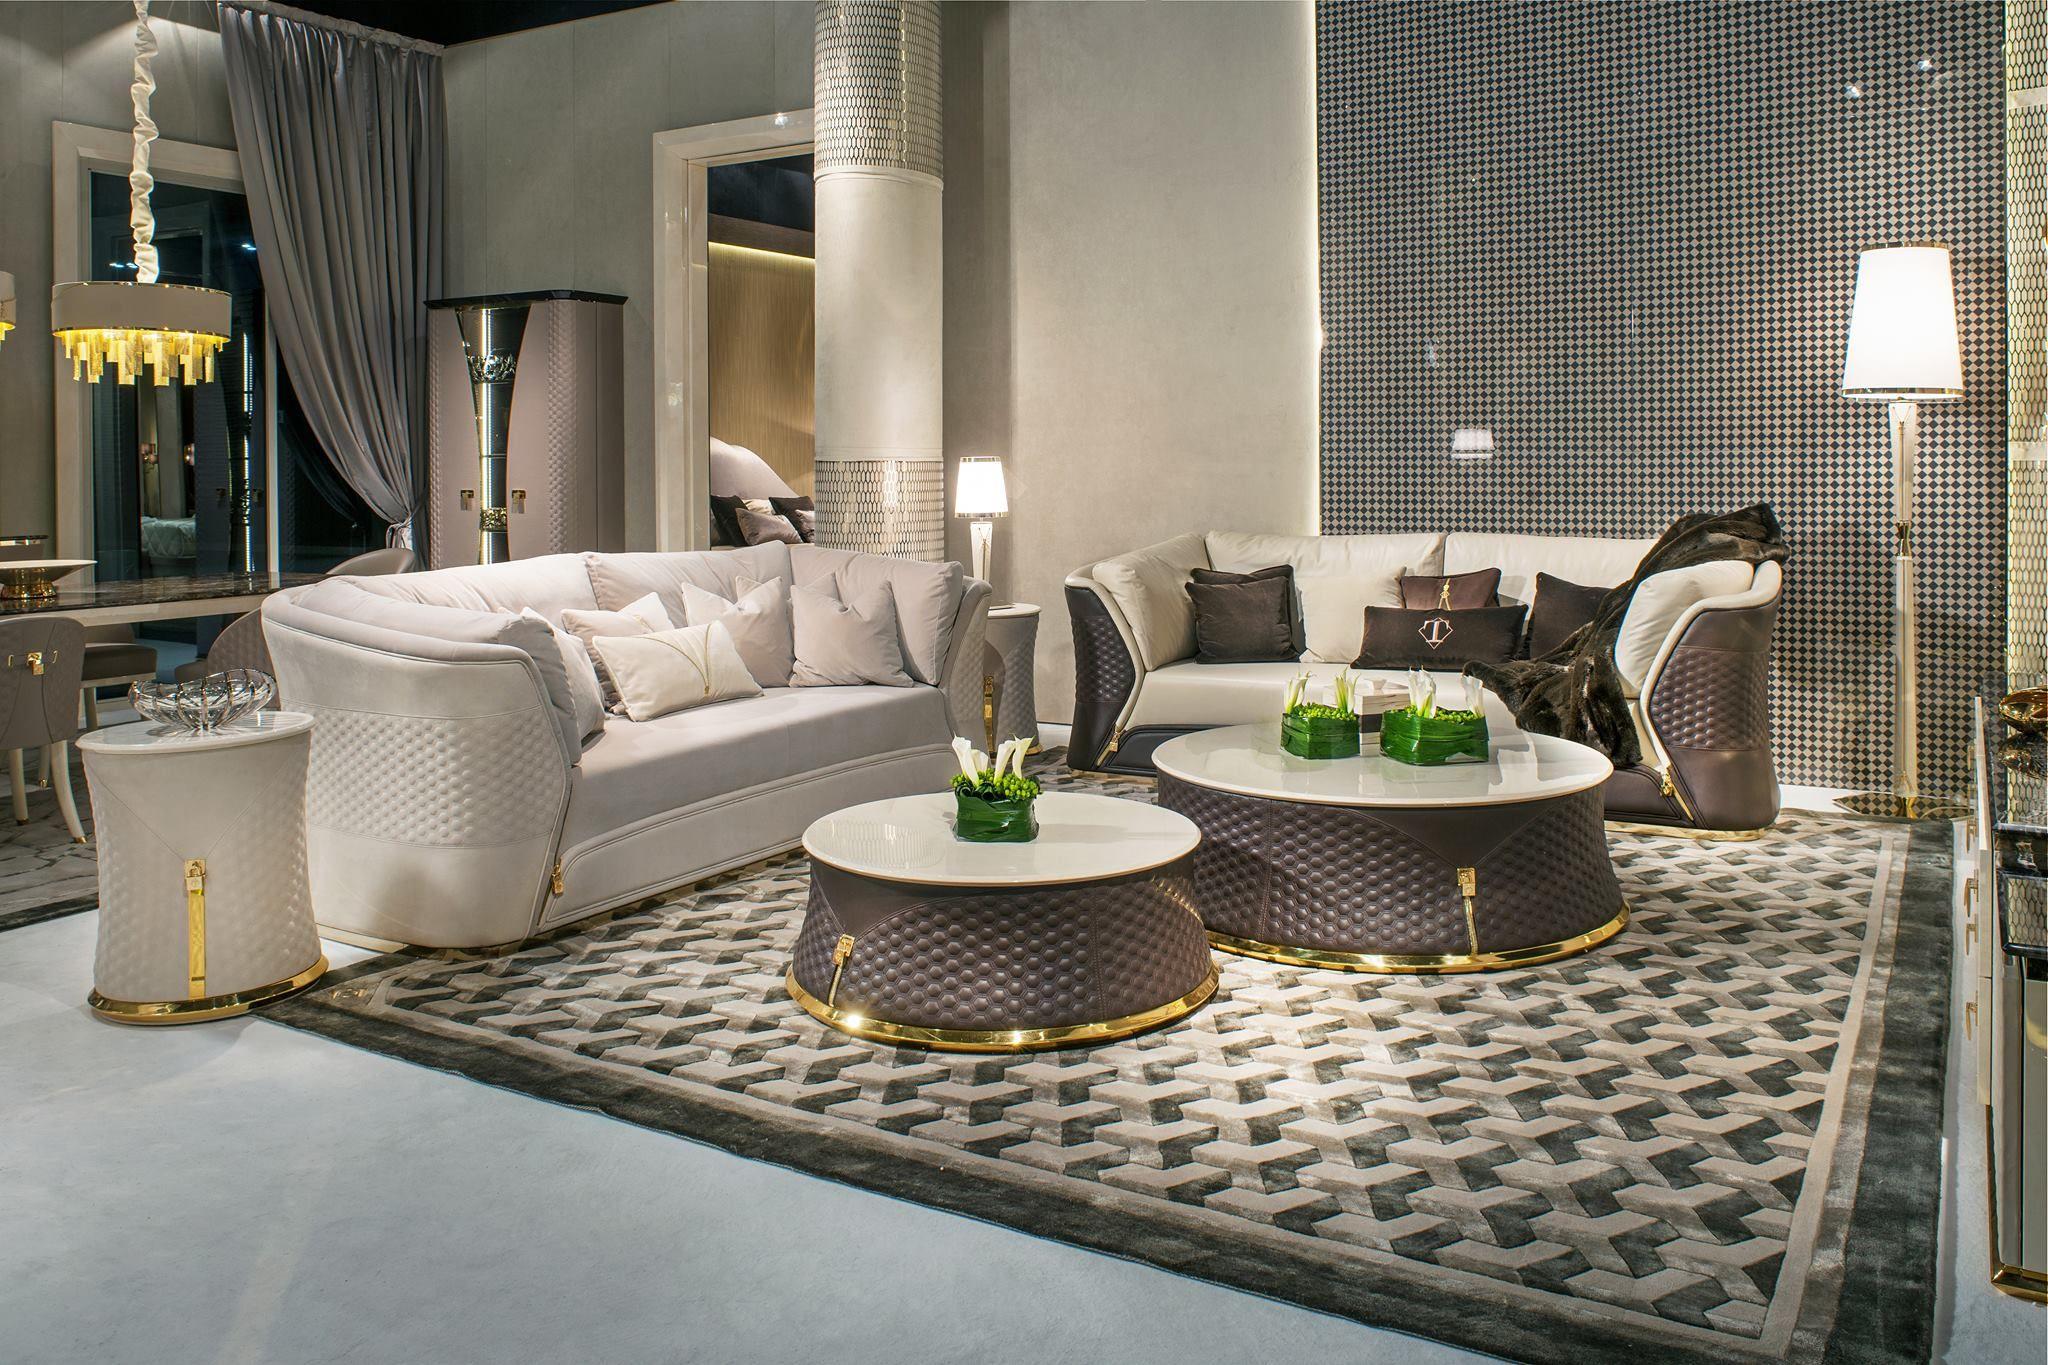 vogue collection for turri designed by andrea bonini art deco interiors pinterest. Black Bedroom Furniture Sets. Home Design Ideas